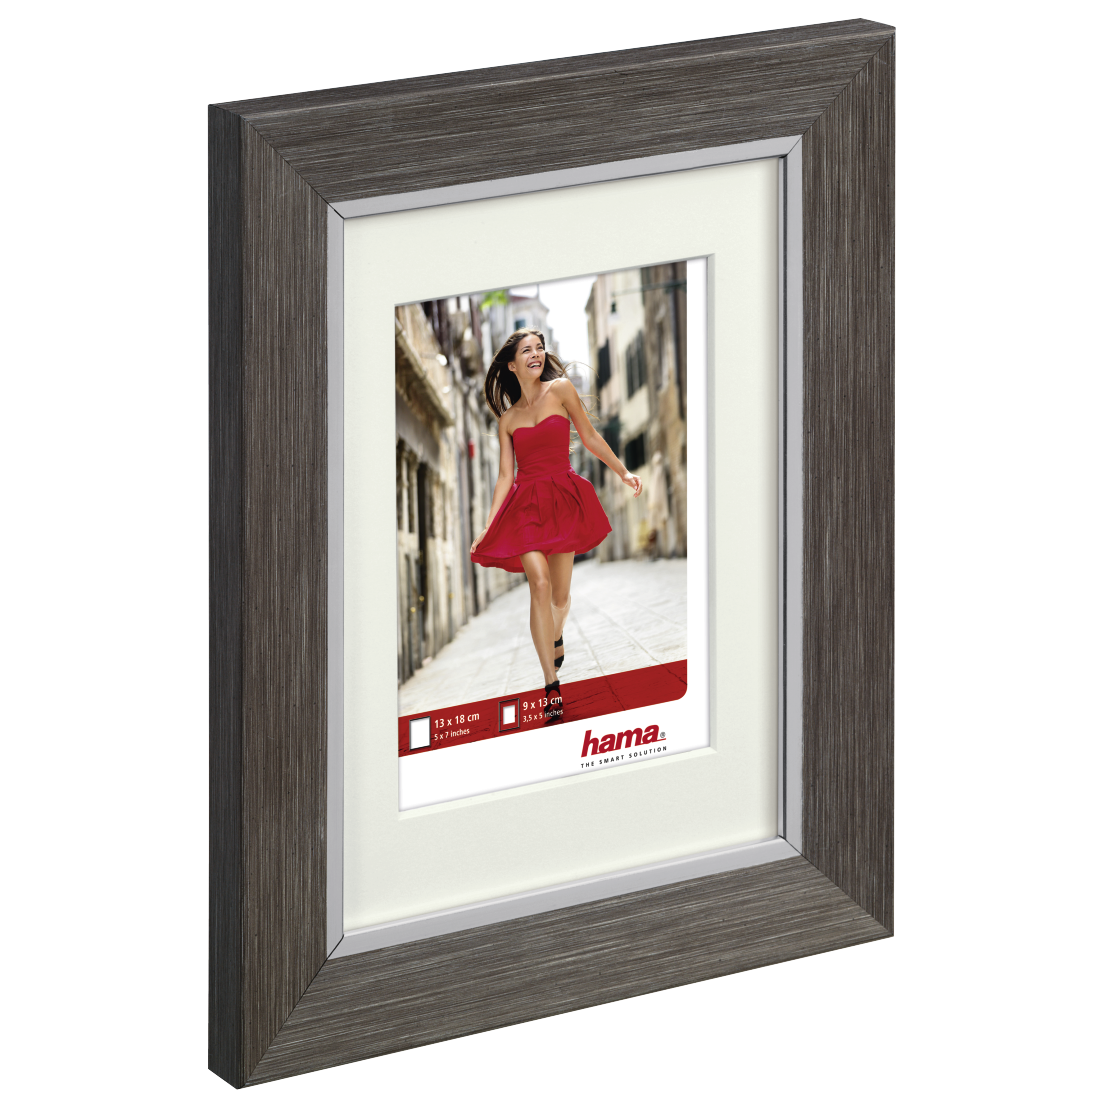 00125652 Hama Porto Plastic Frame Grey Pine 20 X 30 Cm Hama De